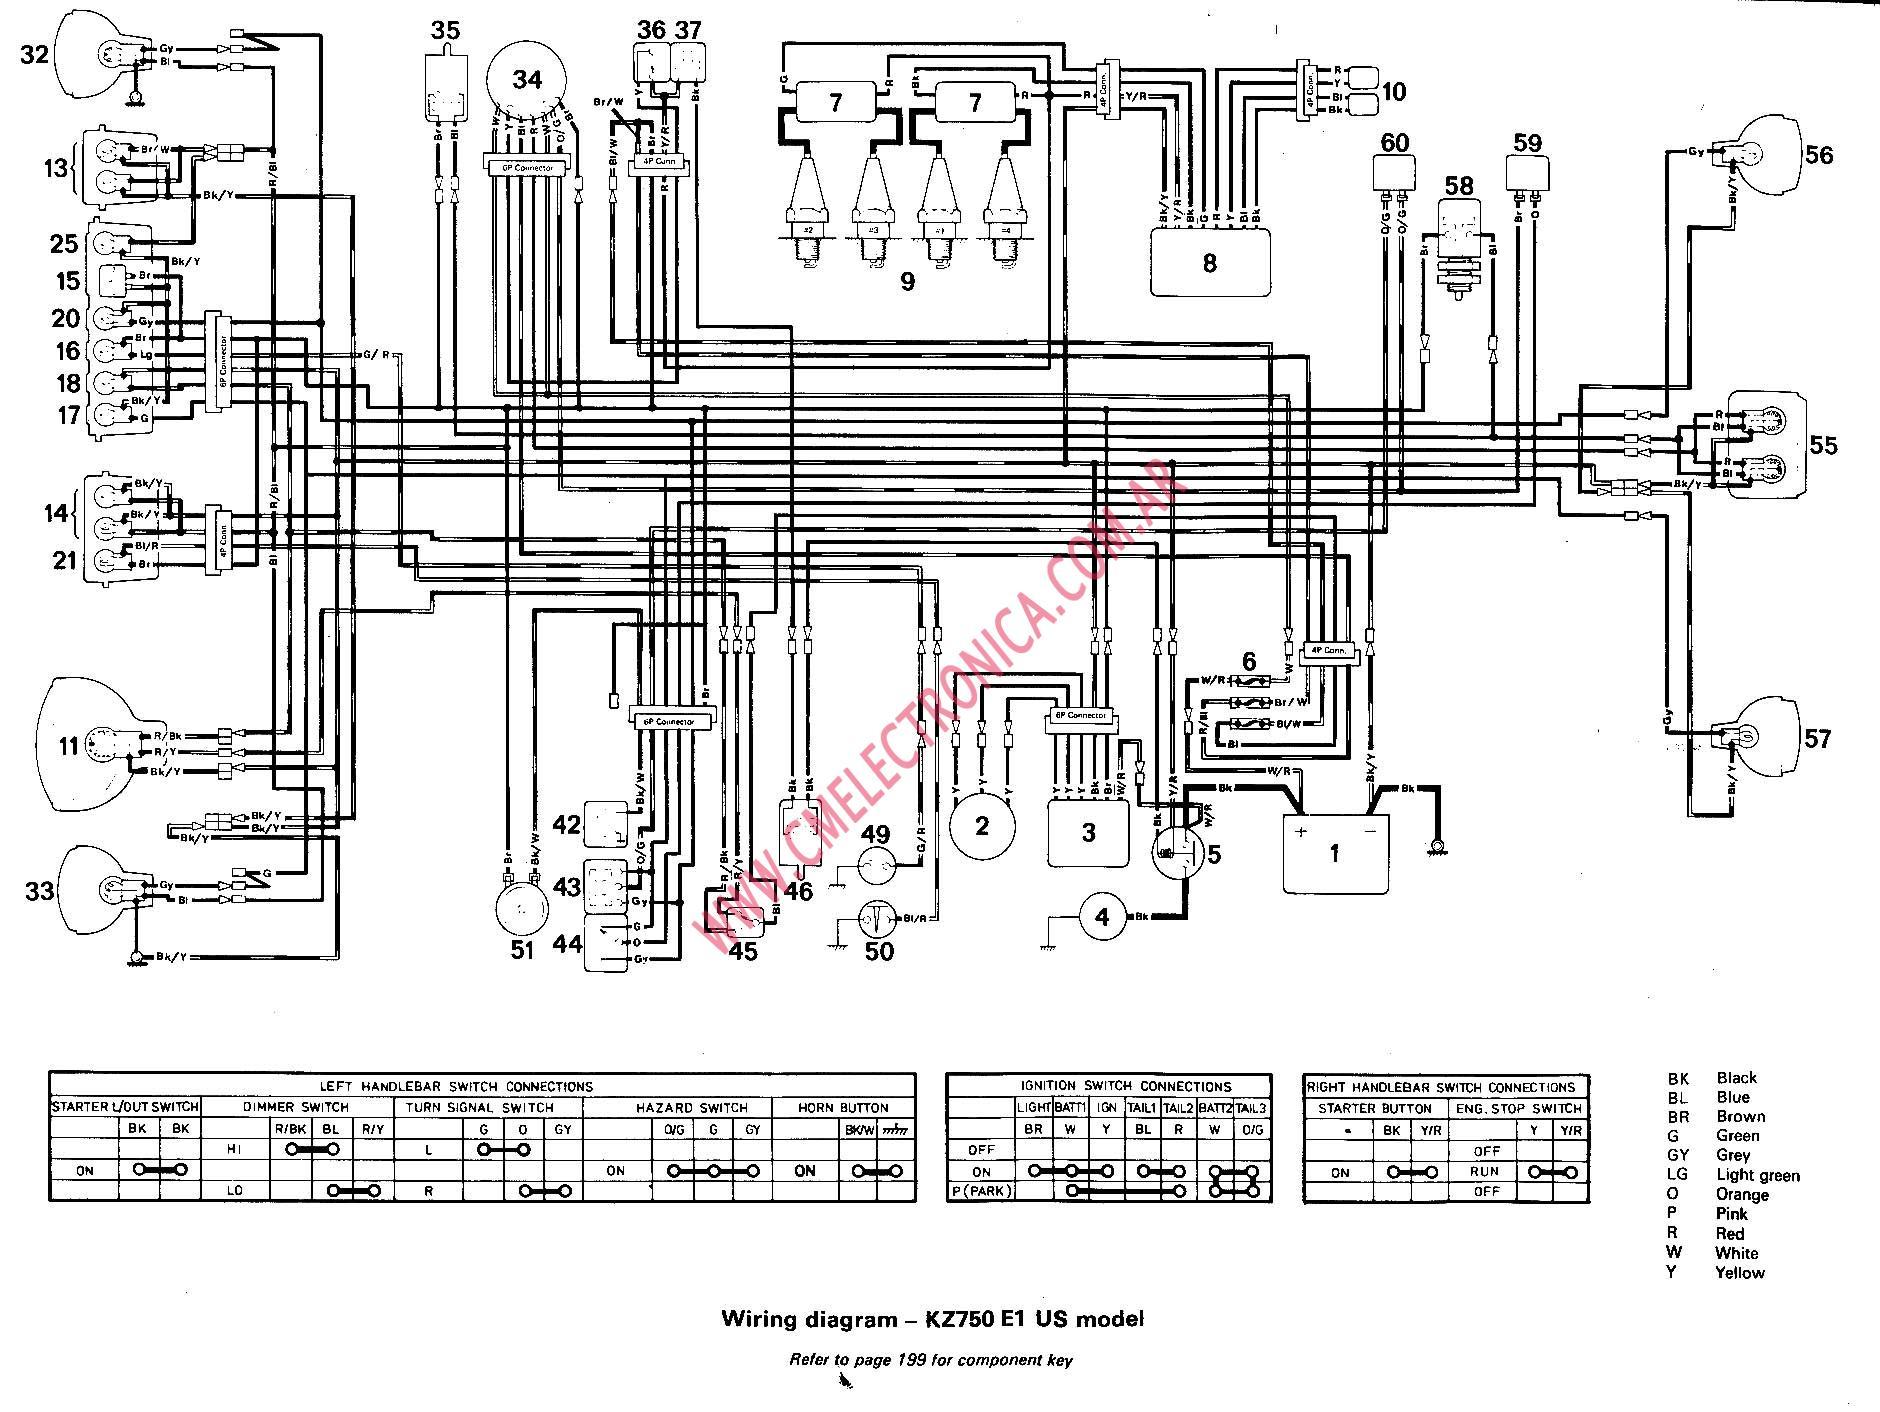 kawasaki kz750 wiring diagram - obd2a wiring diagram -  toshiba.bmw-in-e46.jeanjaures37.fr  wiring diagram resource